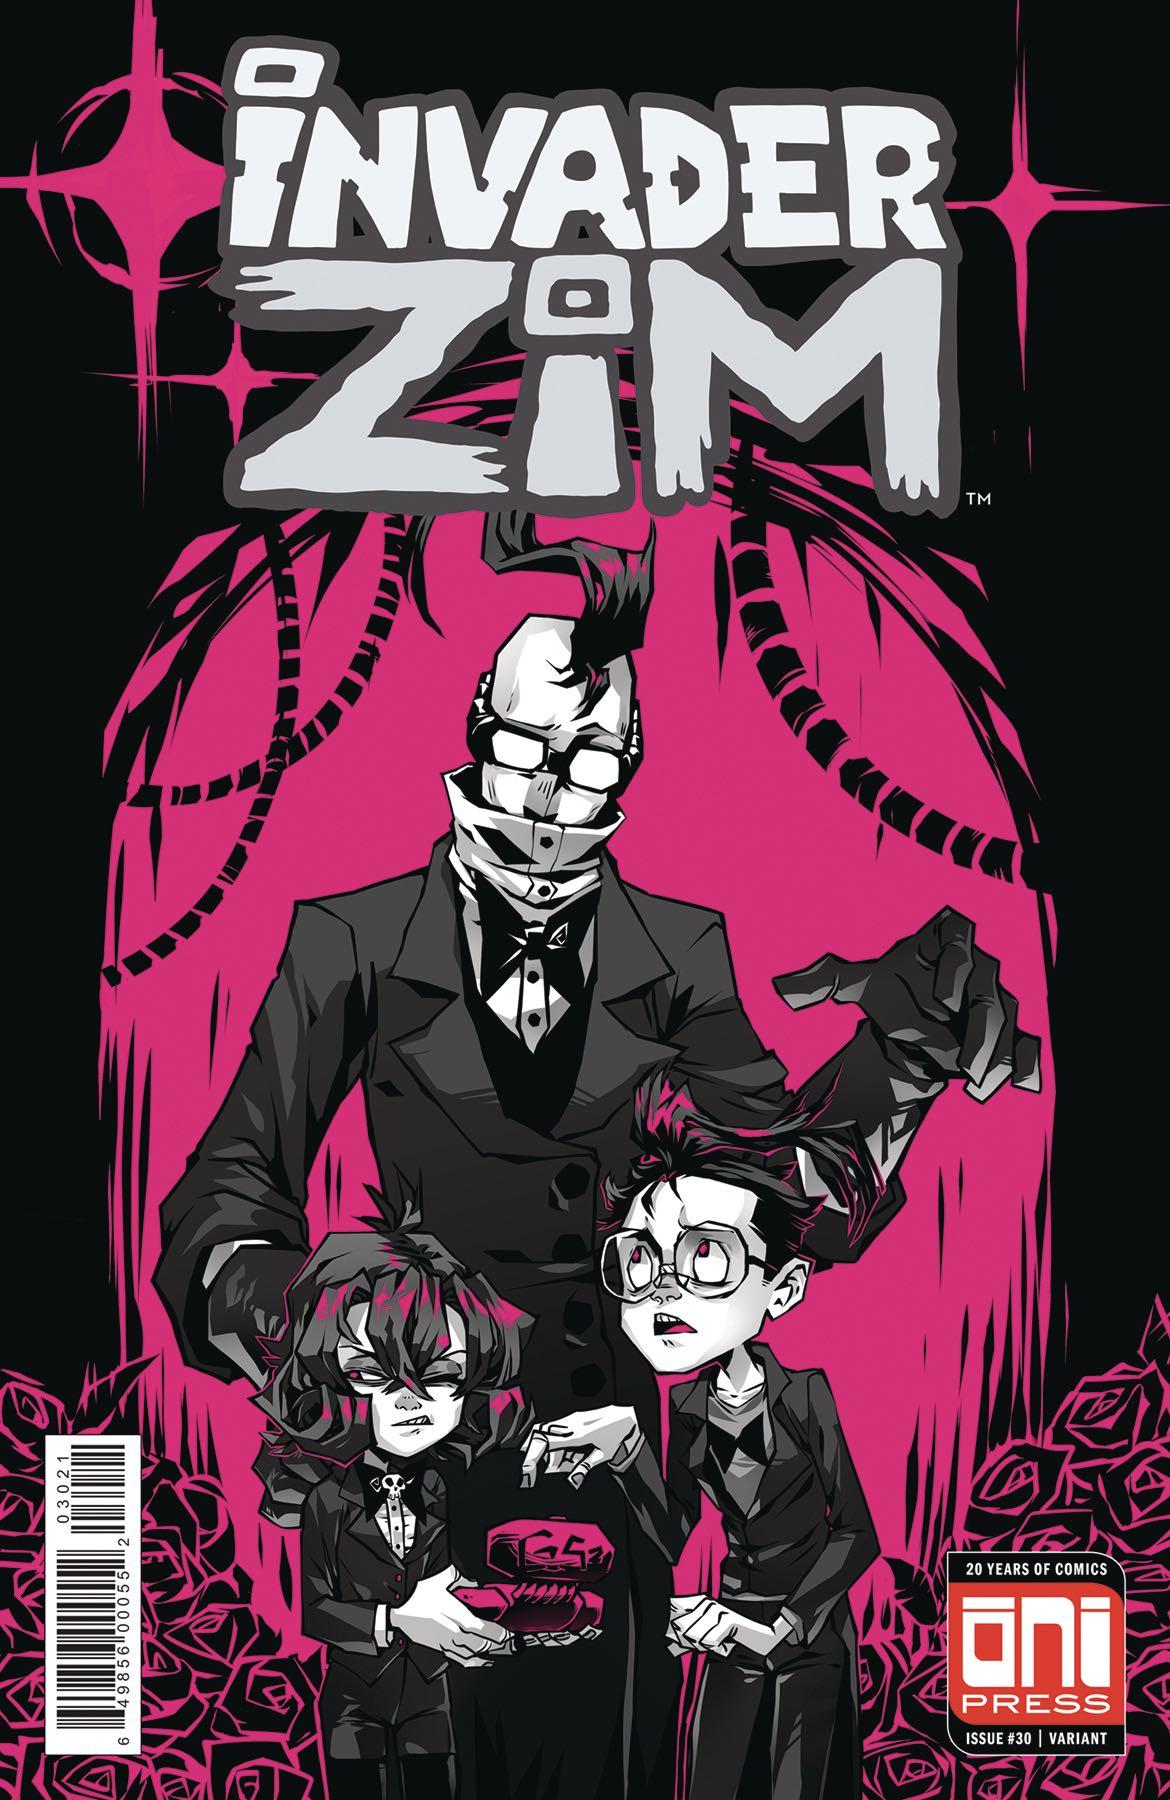 Invader Zim #30 (Krooked Glasses Cover) | Fresh Comics